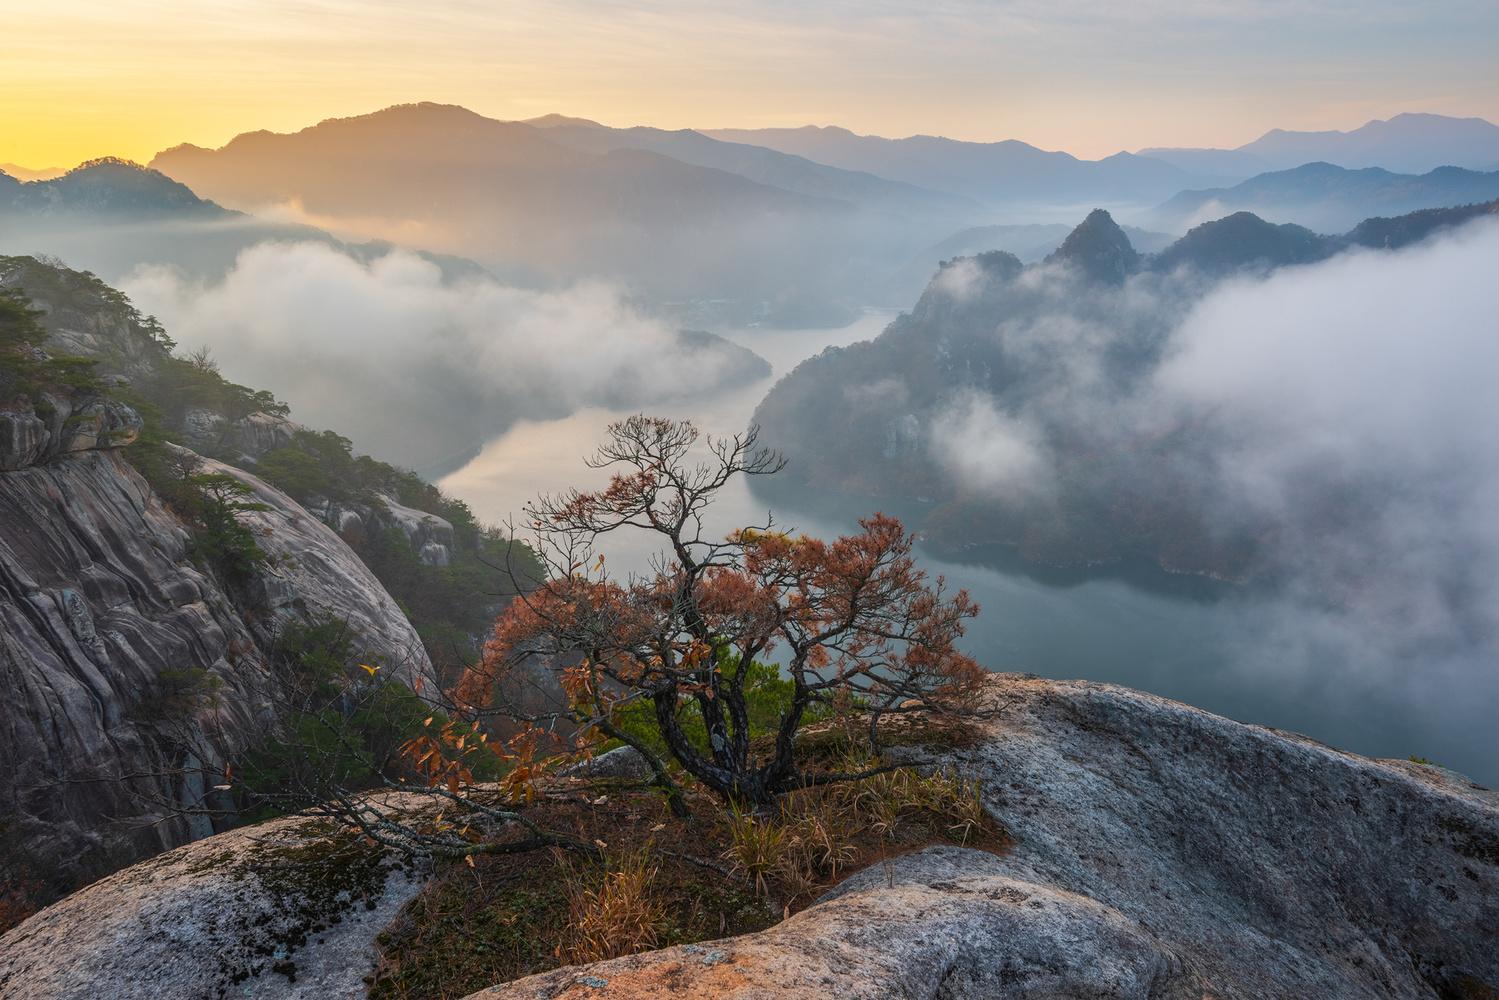 The last autumn of the tree by jaeyoun Ryu